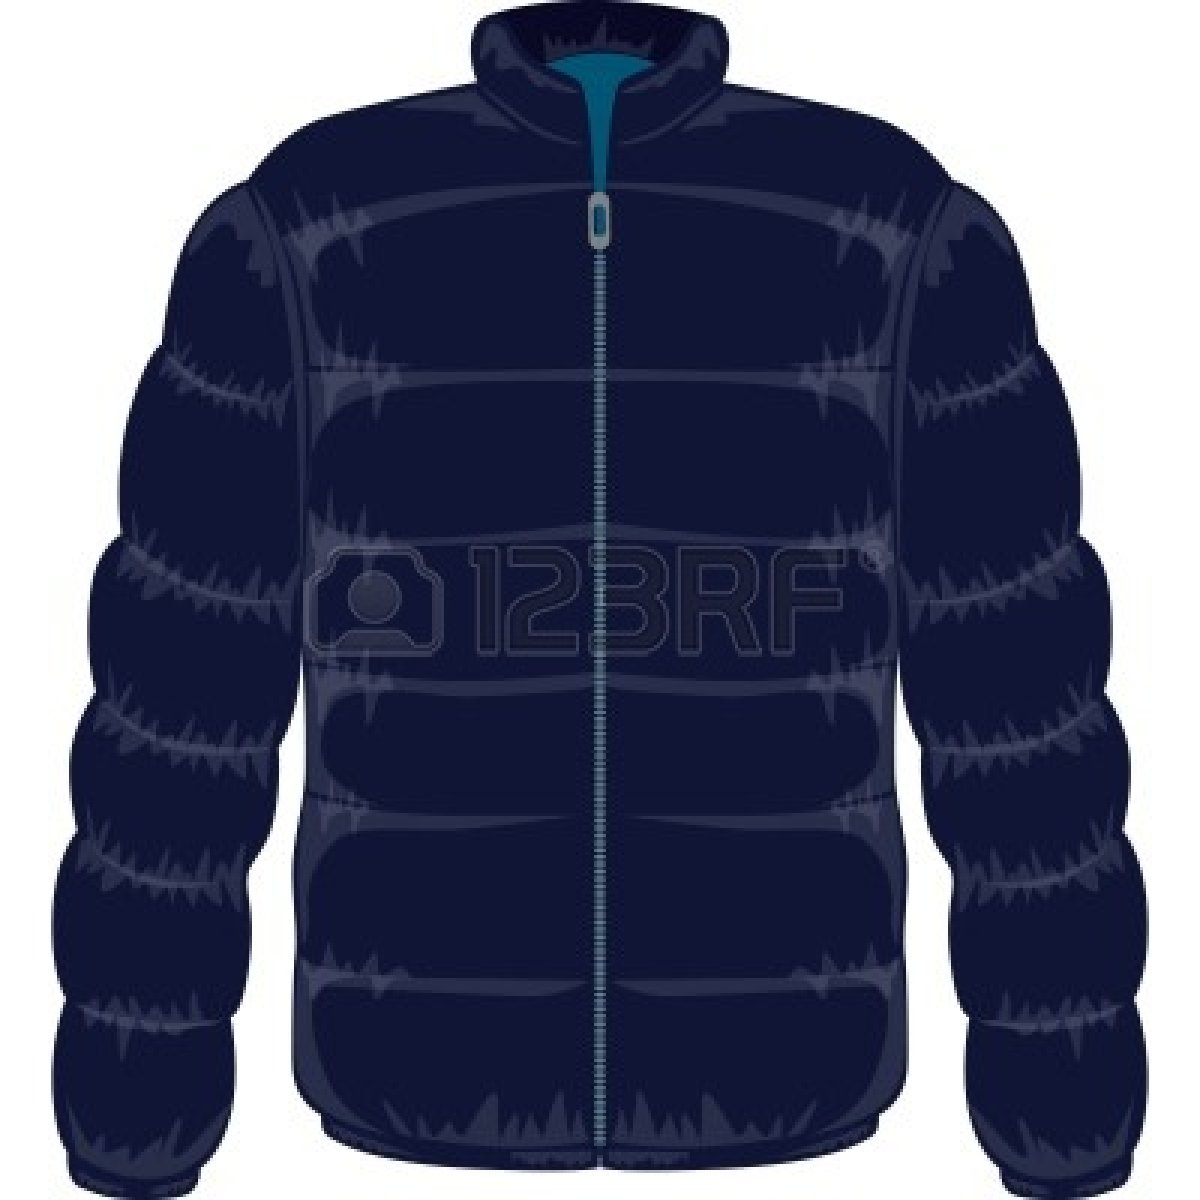 Winter clipart coat. Jacket panda free images